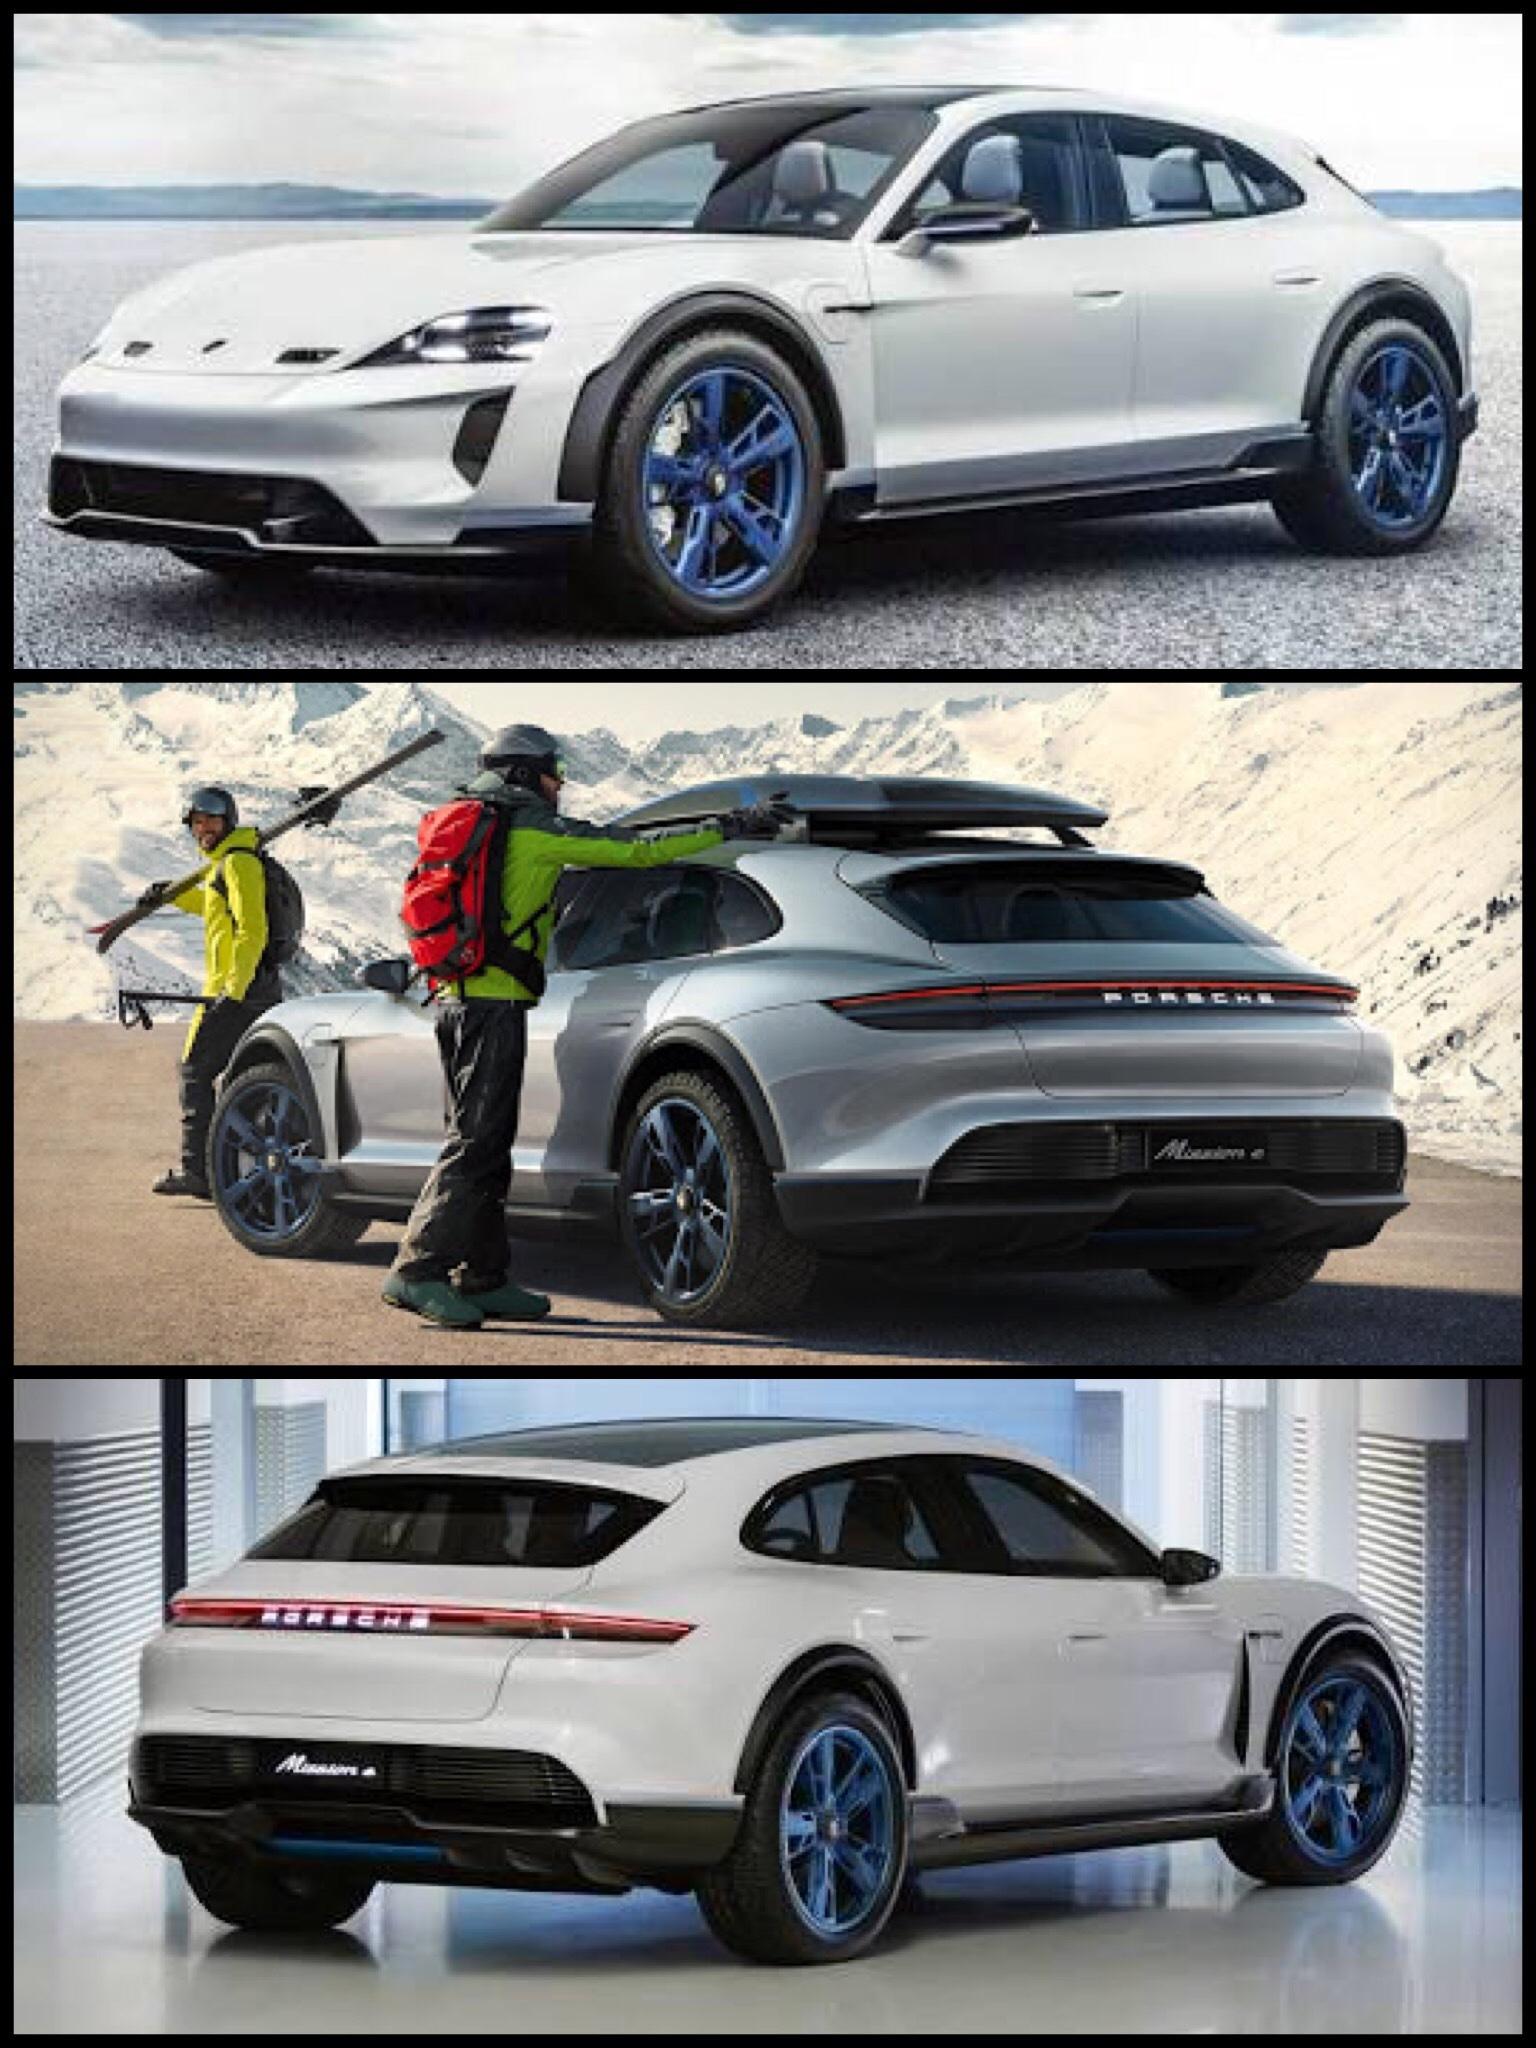 Porsche Mission E Cross Turismo concept ポルシェ ミッションE クロスツーリスモ